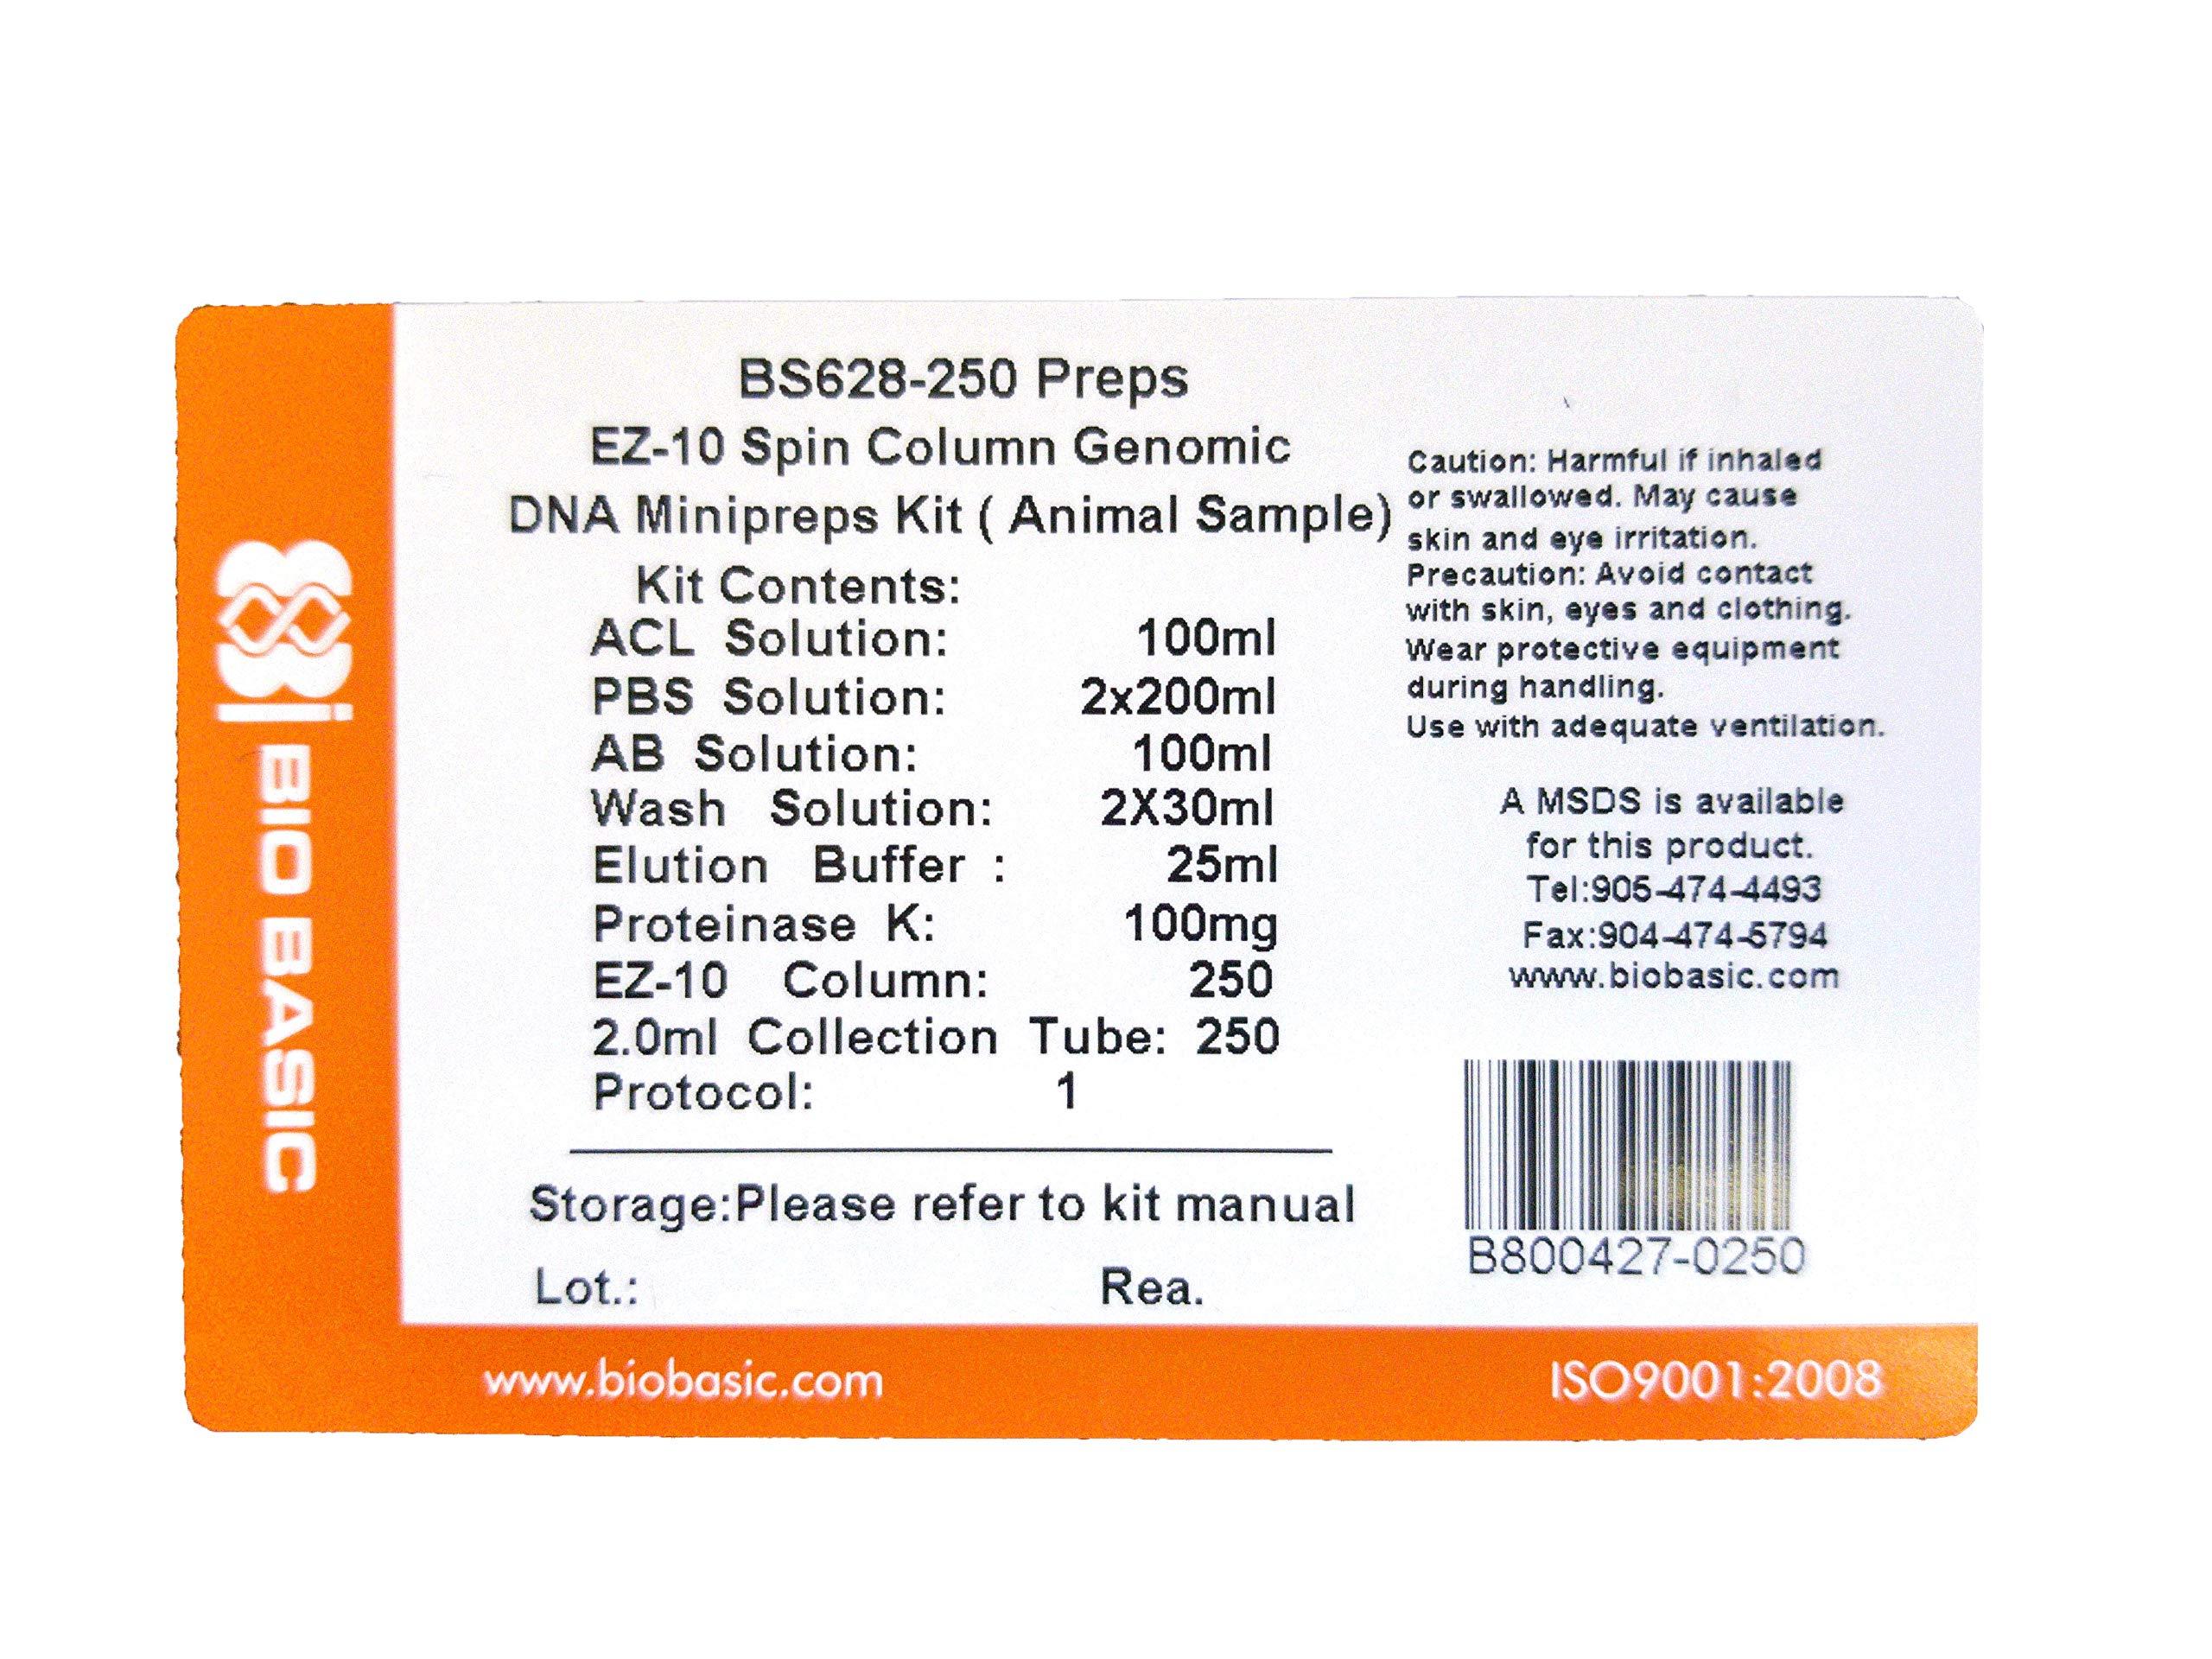 EZ-10 Spin Column Animal Genomic DNA Miniprep Kit, 250 Preparations by Bio Basic (Image #1)